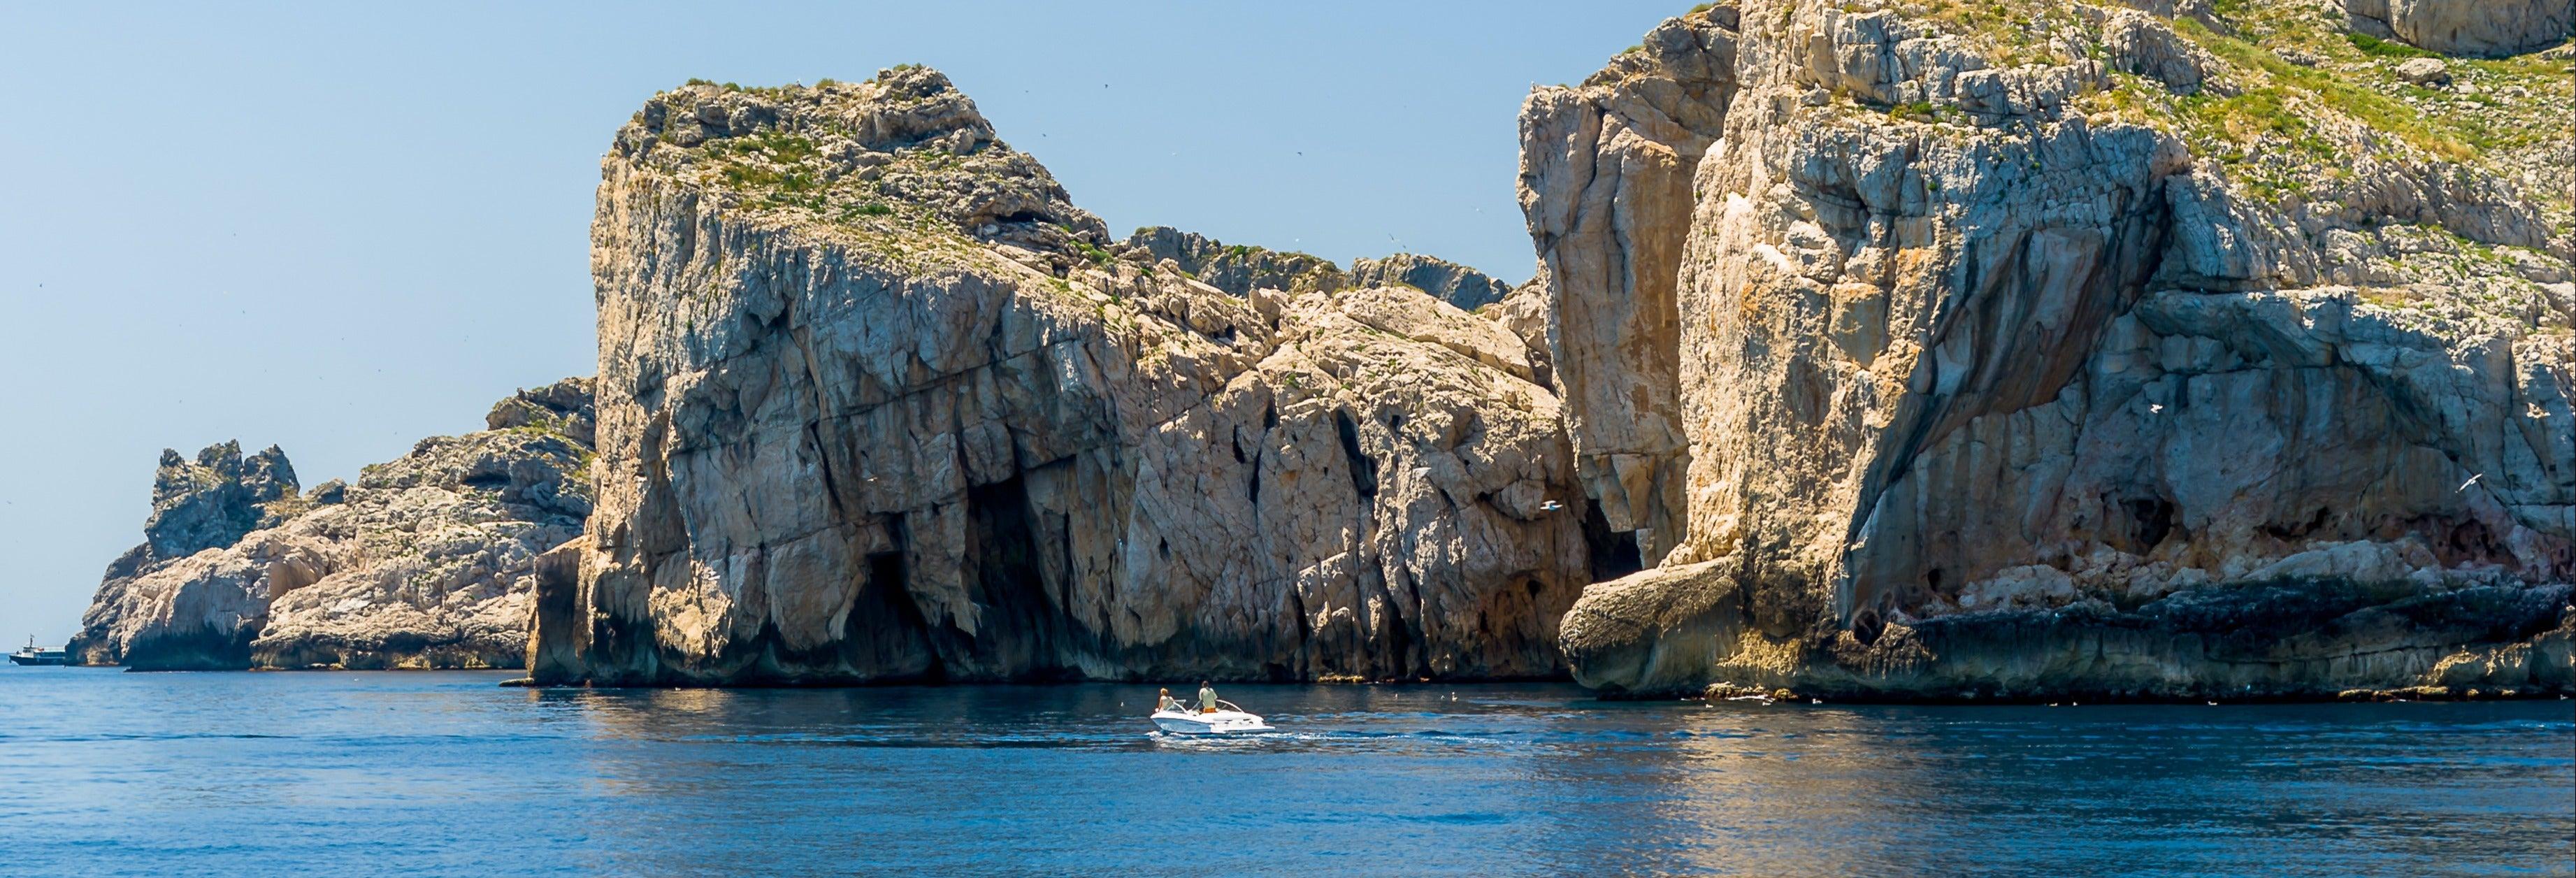 Medes Islands Catamaran Cruise